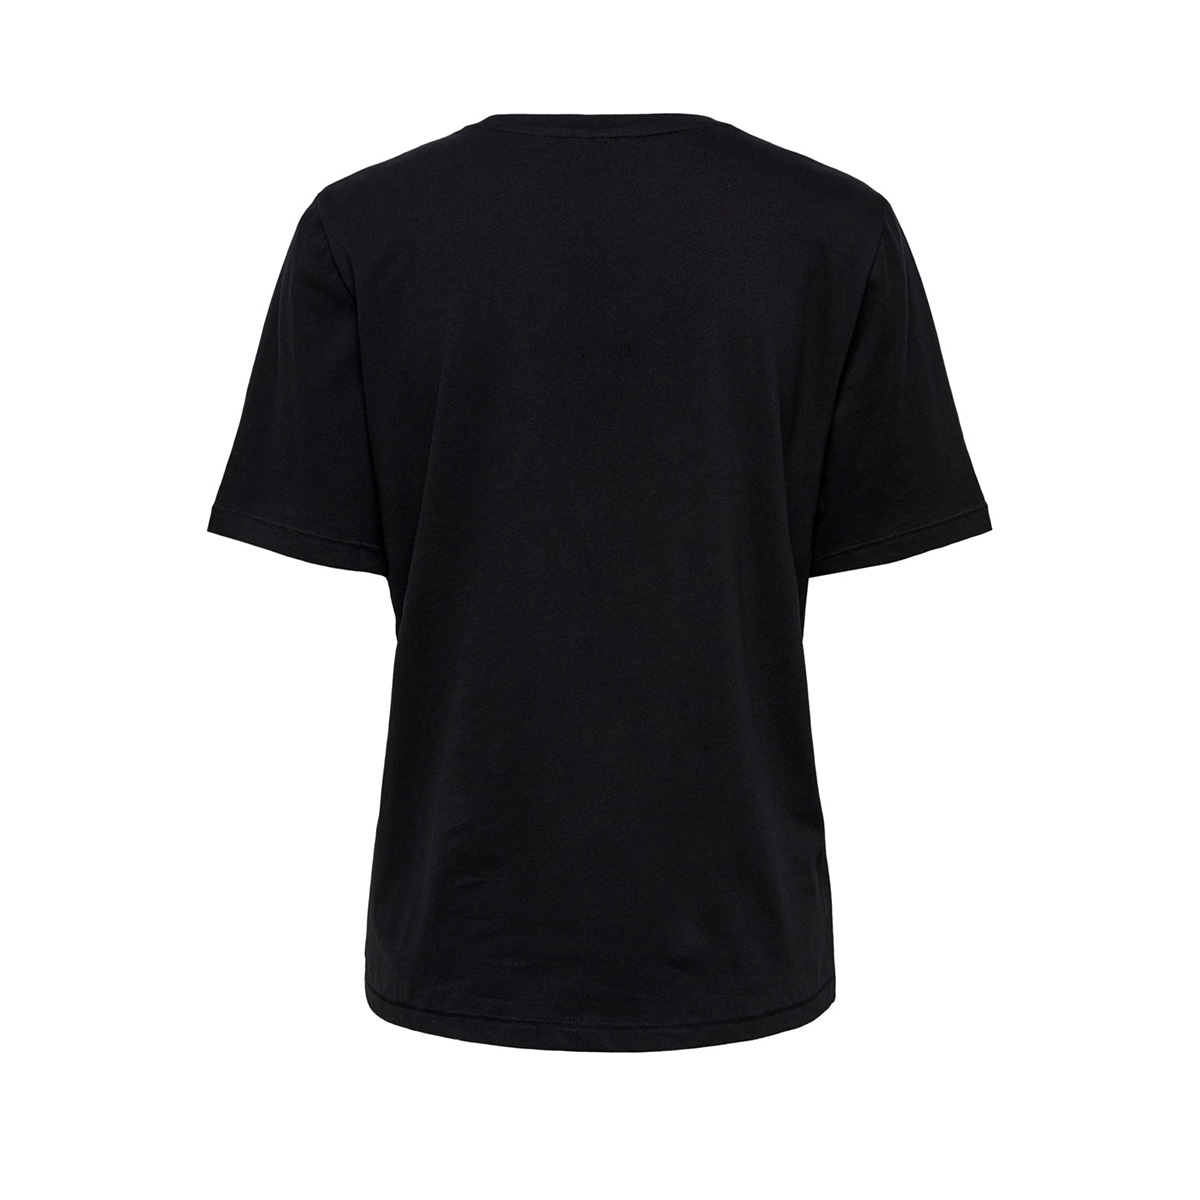 onlmode boxy s/s top box jrs 15195469 only t-shirt black/black